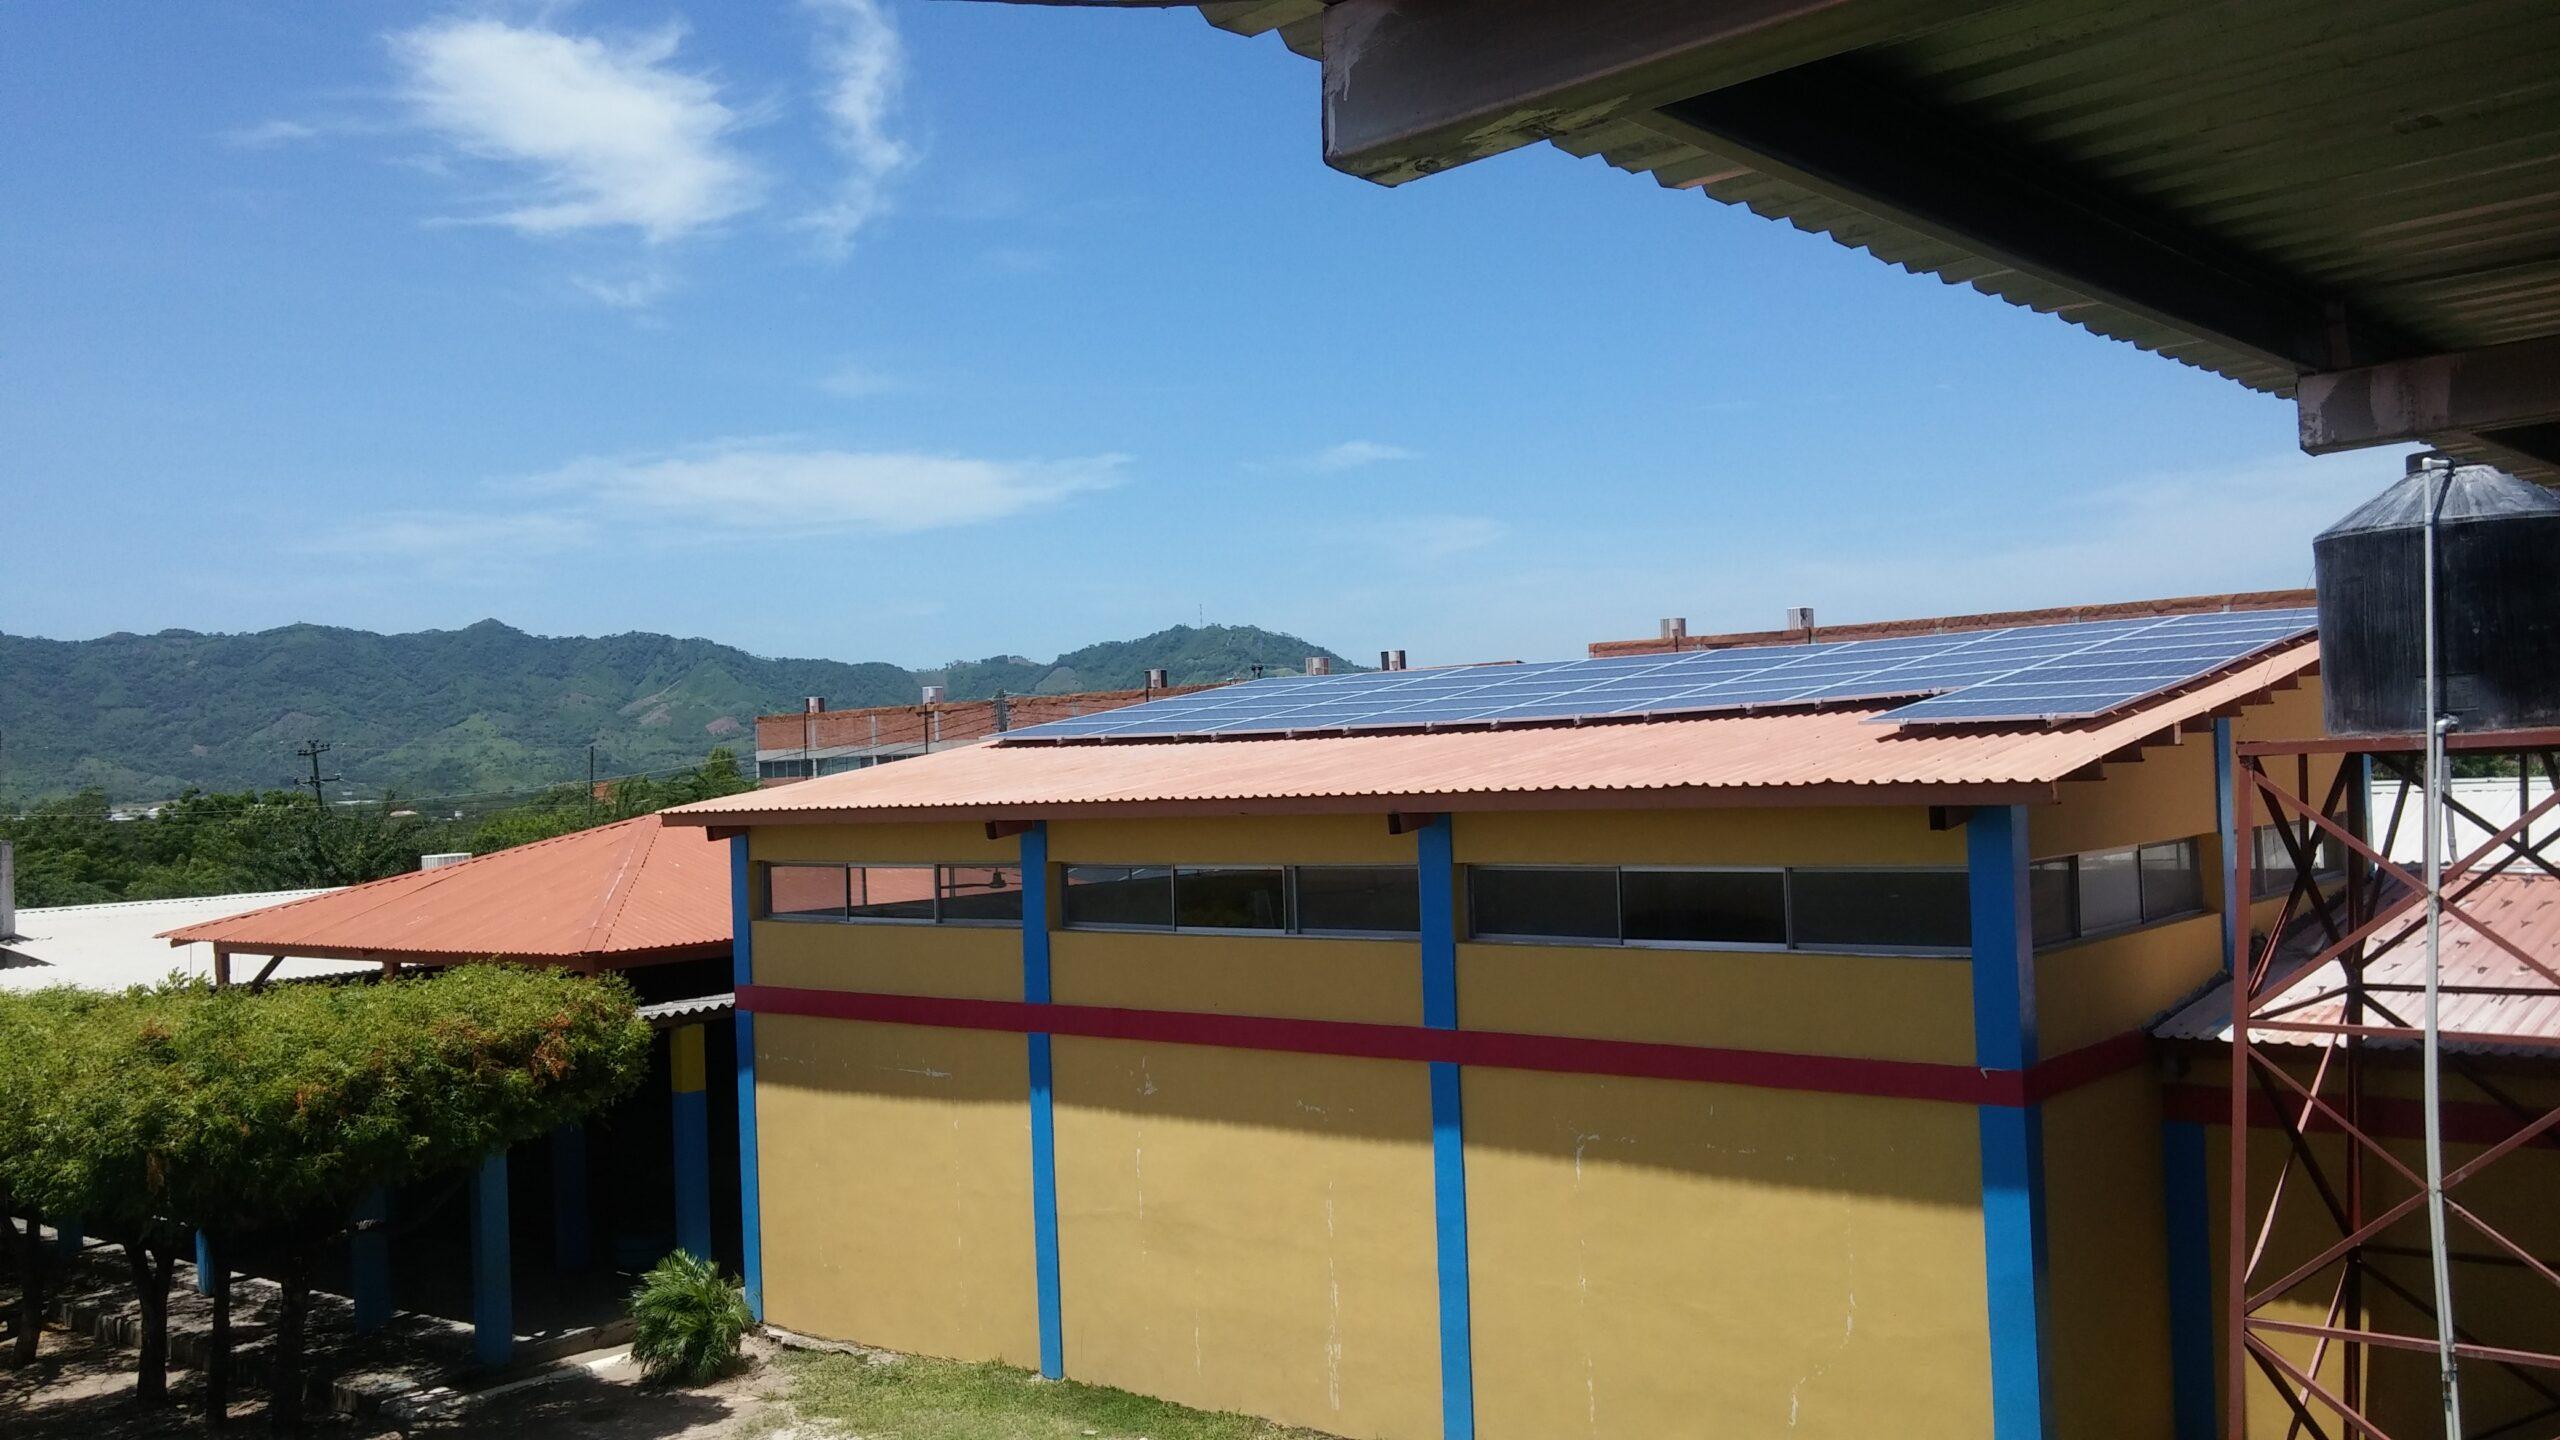 SOUTH INTERNATIONAL SCHOOL